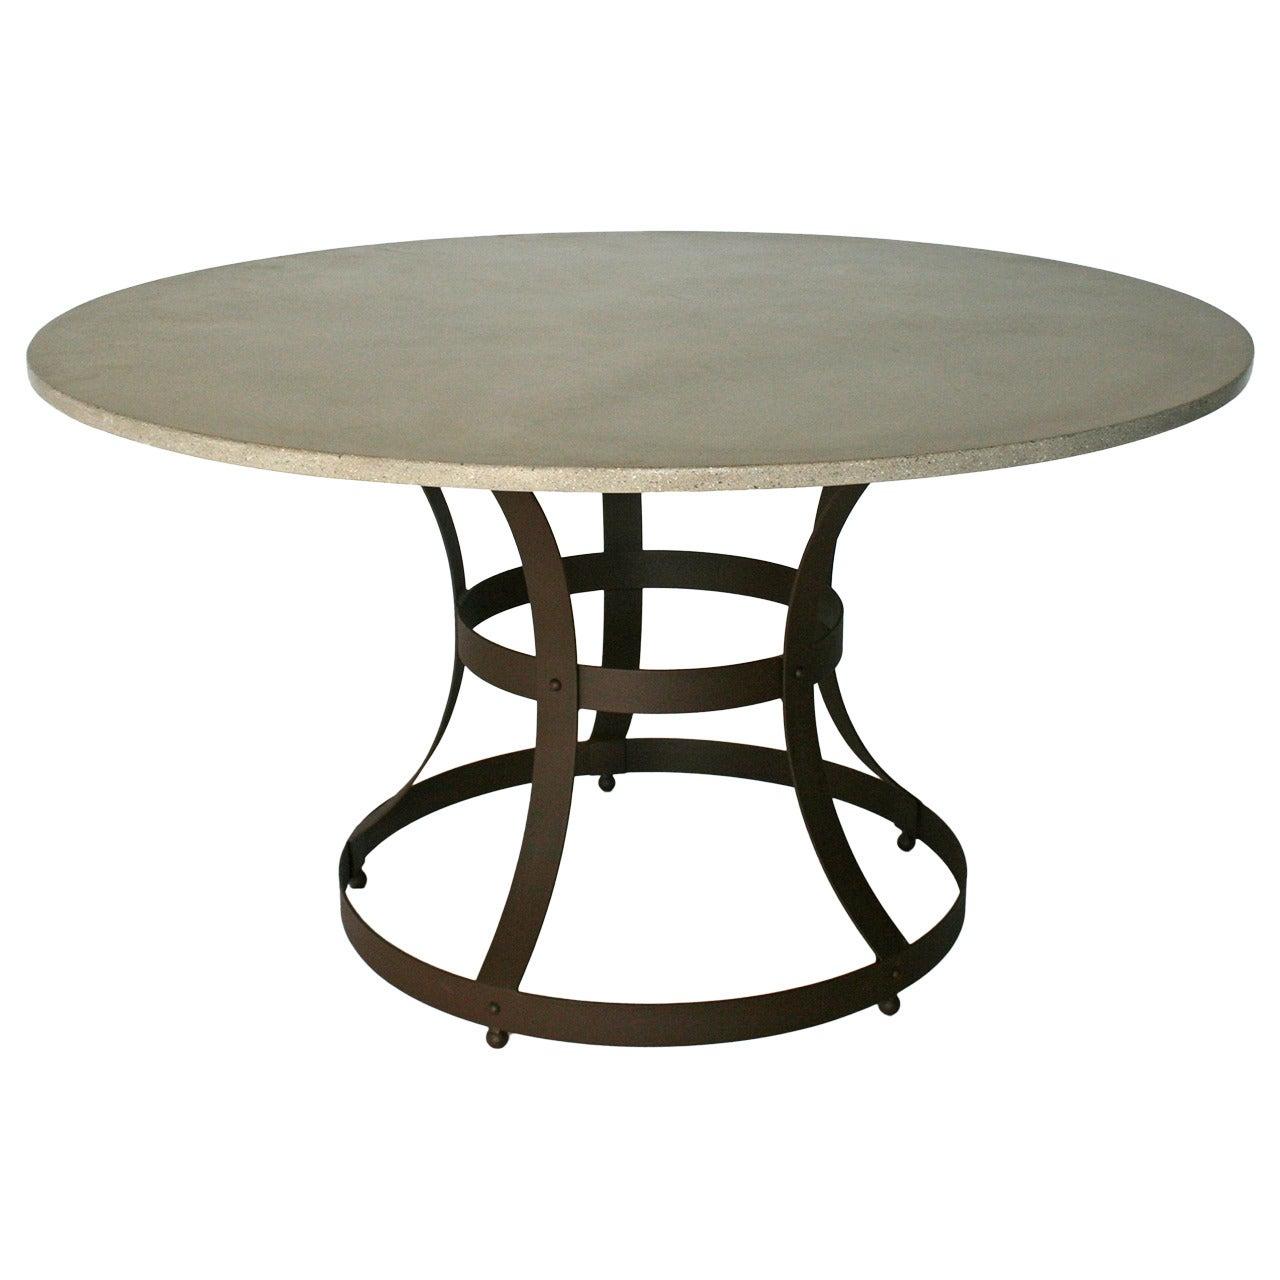 "James de Wulf Concrete Hourglass Dining Table, 60"""